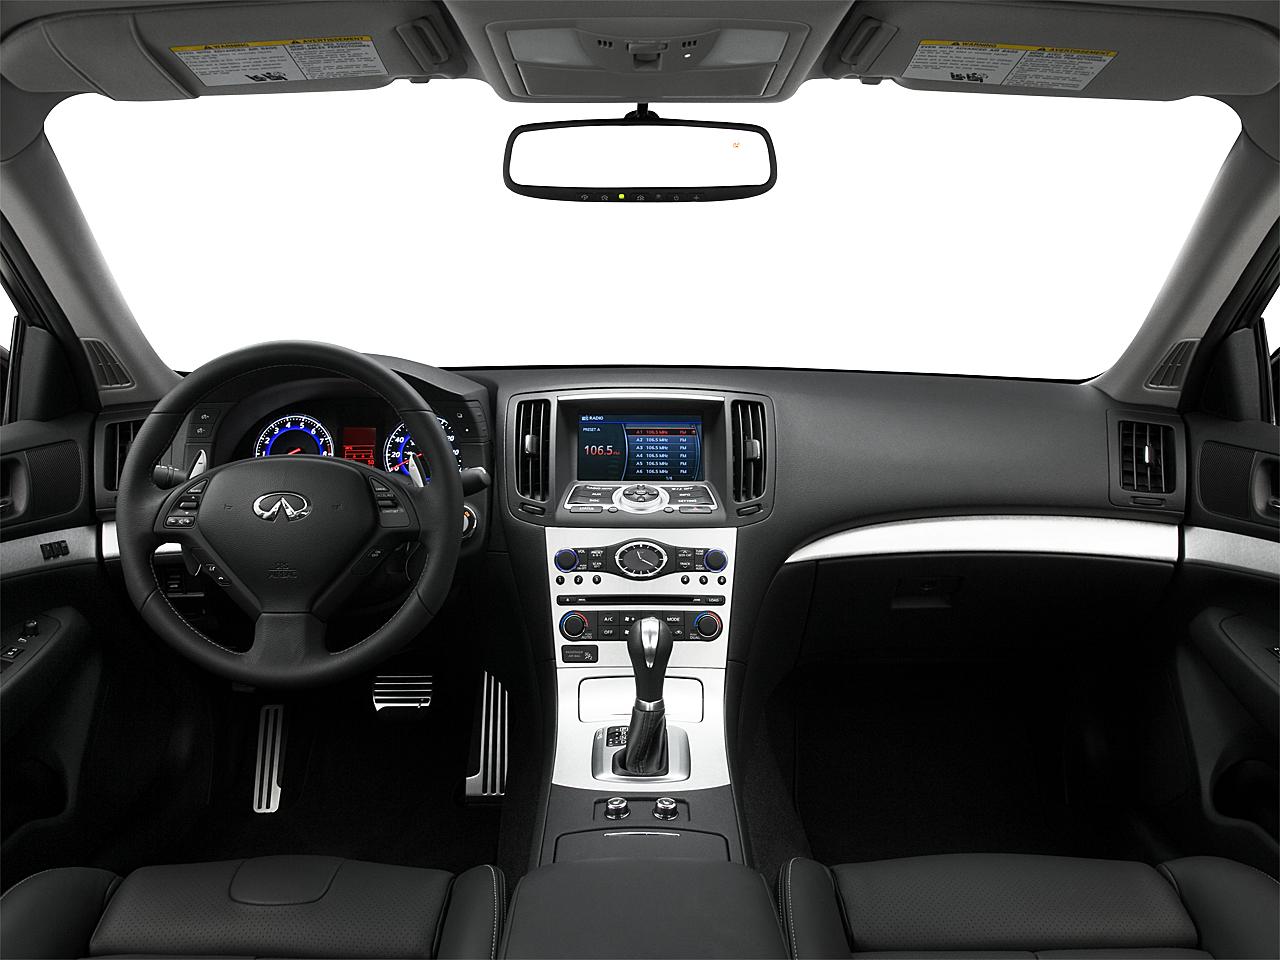 2009 infiniti g37 sedan awd x 4dr sedan research groovecar 2009 infiniti g sedan g37s journey centered wide dash shot vanachro Choice Image